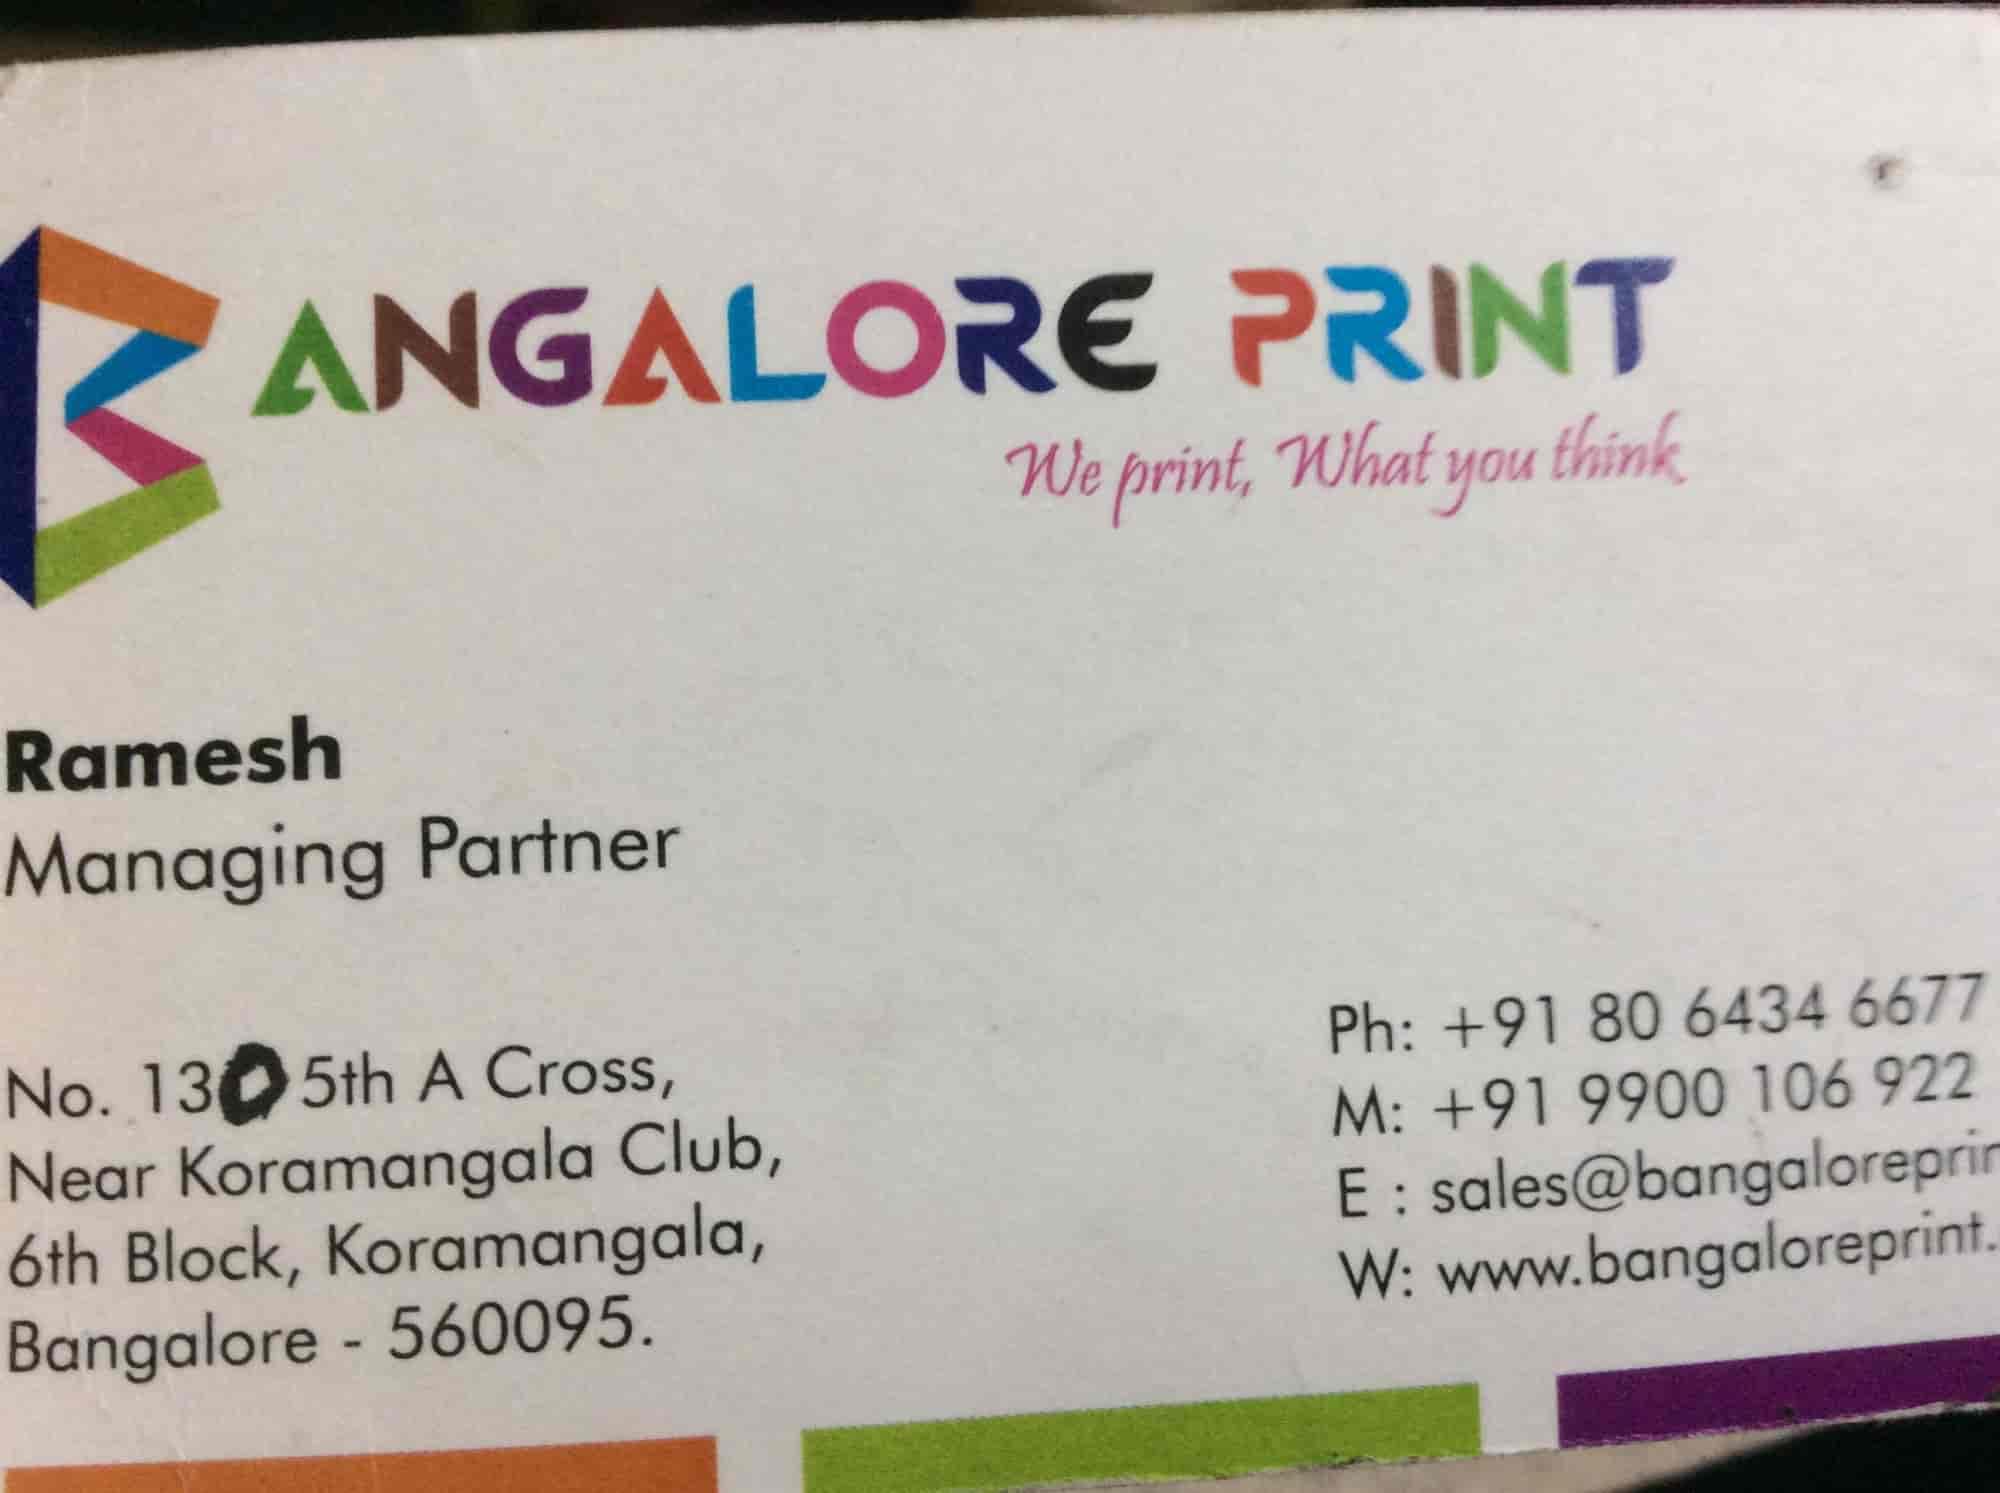 wedding card printers in bangalore indiranagar%0A Bangalore Print  Koramangala  th Block  Printing Press in Bangalore   Justdial